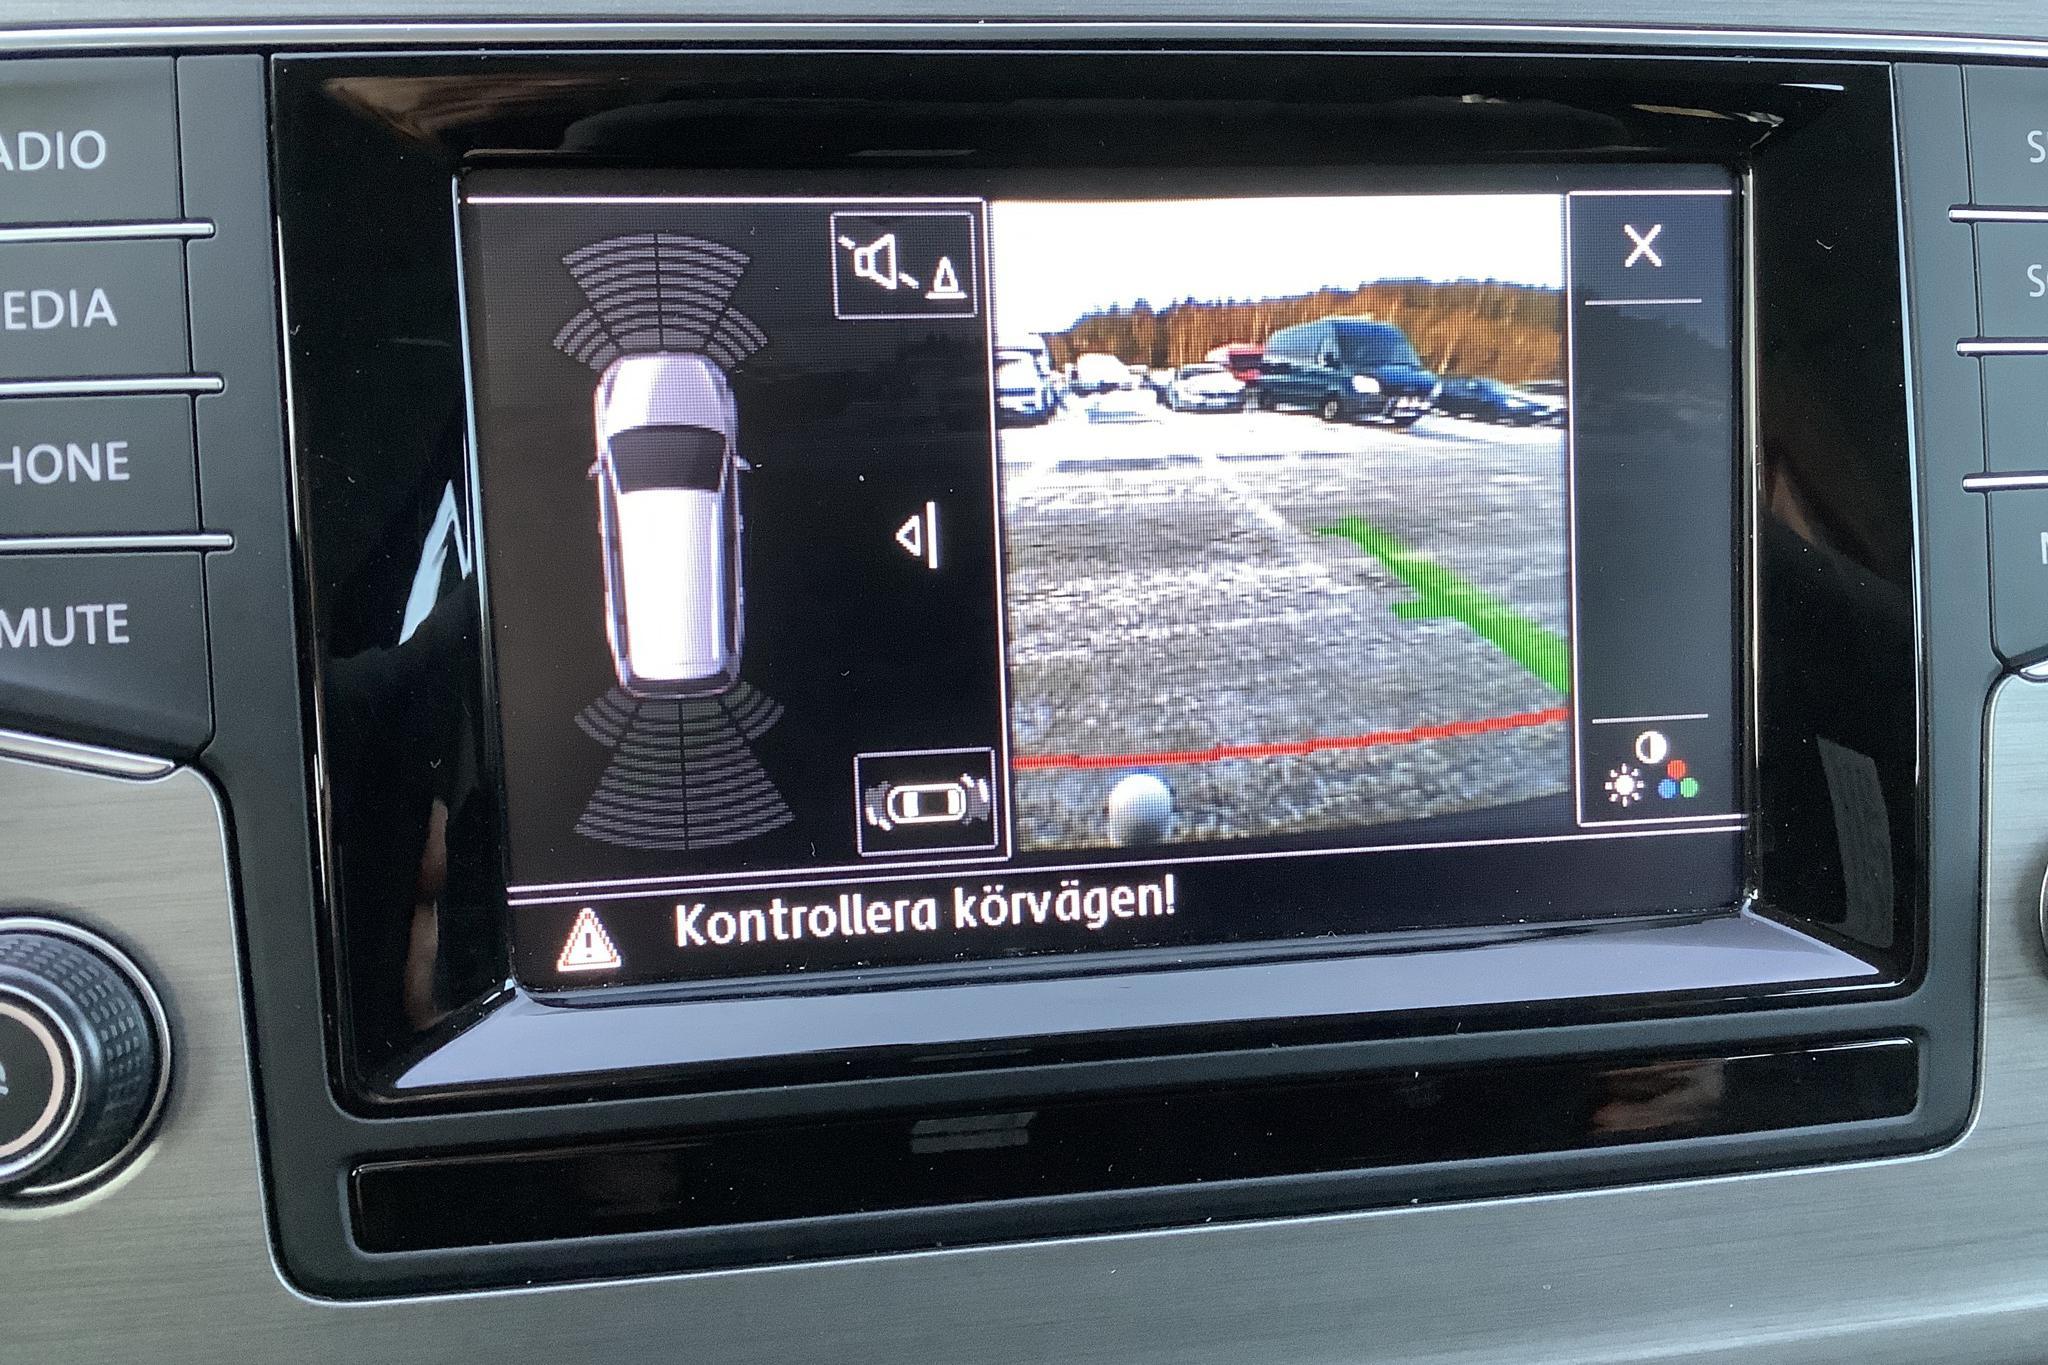 VW Golf VII 1.4 TSI Sportscombi (122hk) - 122 910 km - Manual - black - 2014